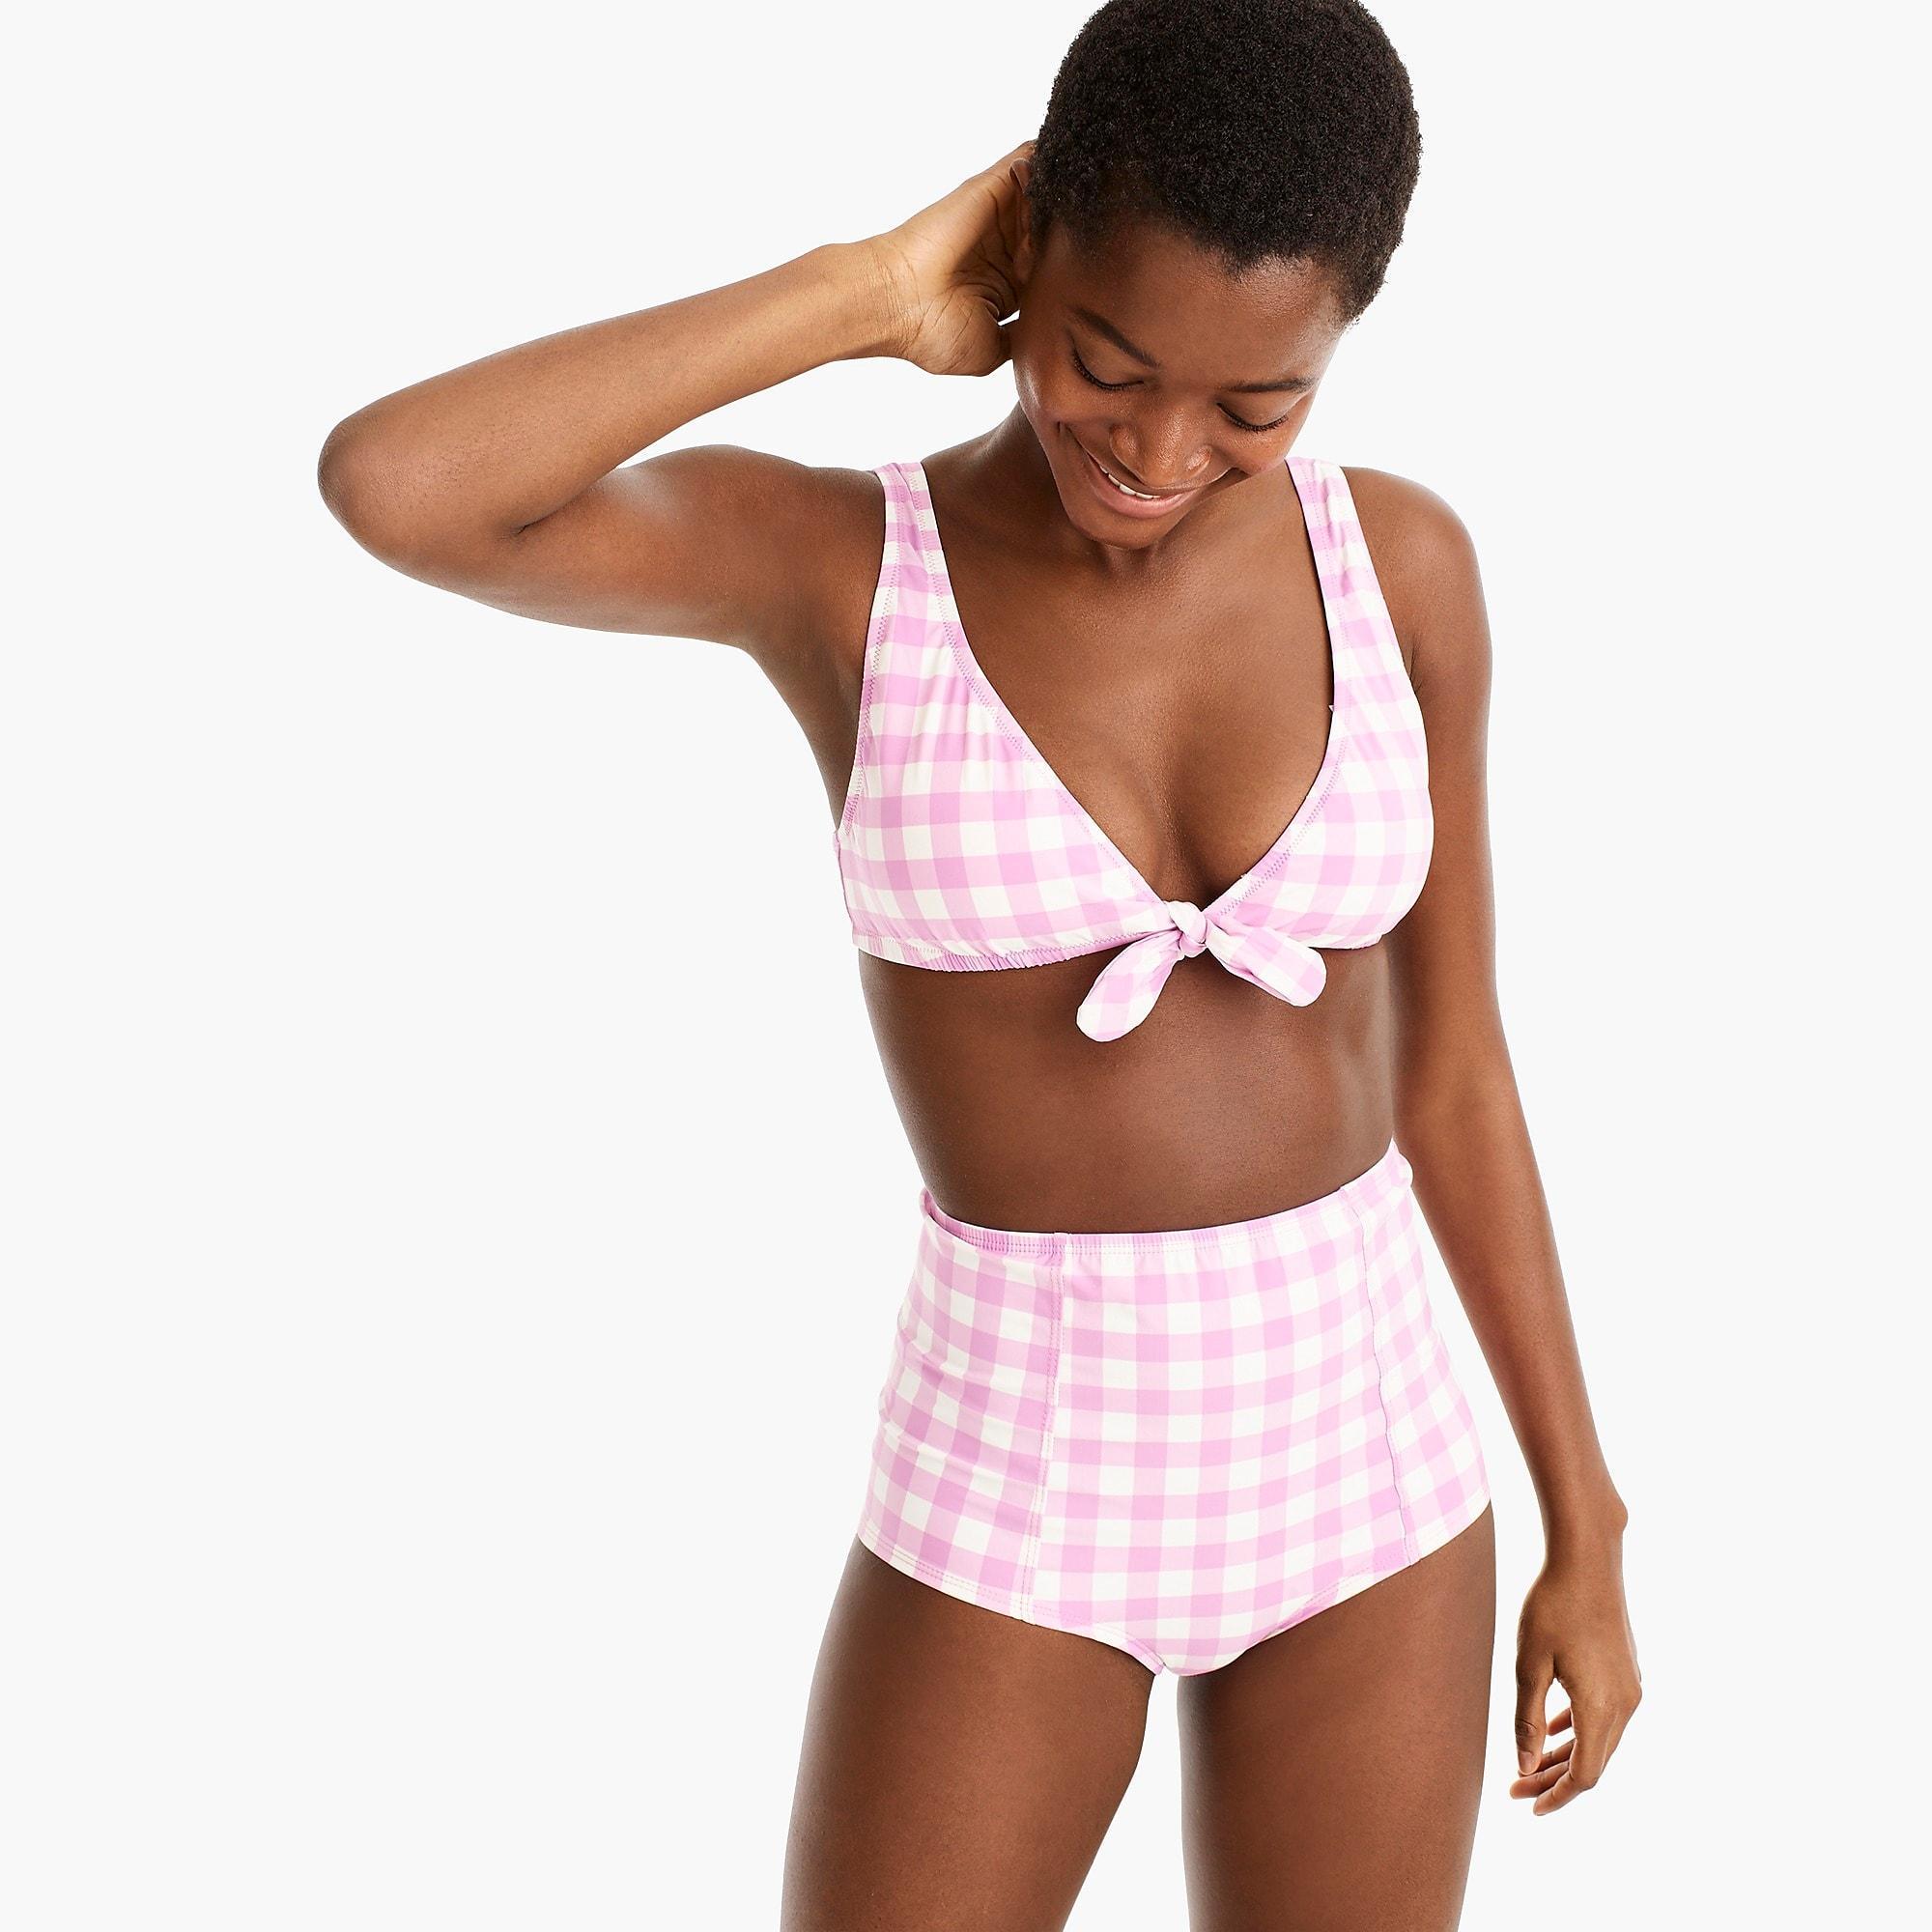 e13429cd6f J.Crew. Women's Tie-front Scoopback Bikini Top In Oversized Matte Gingham